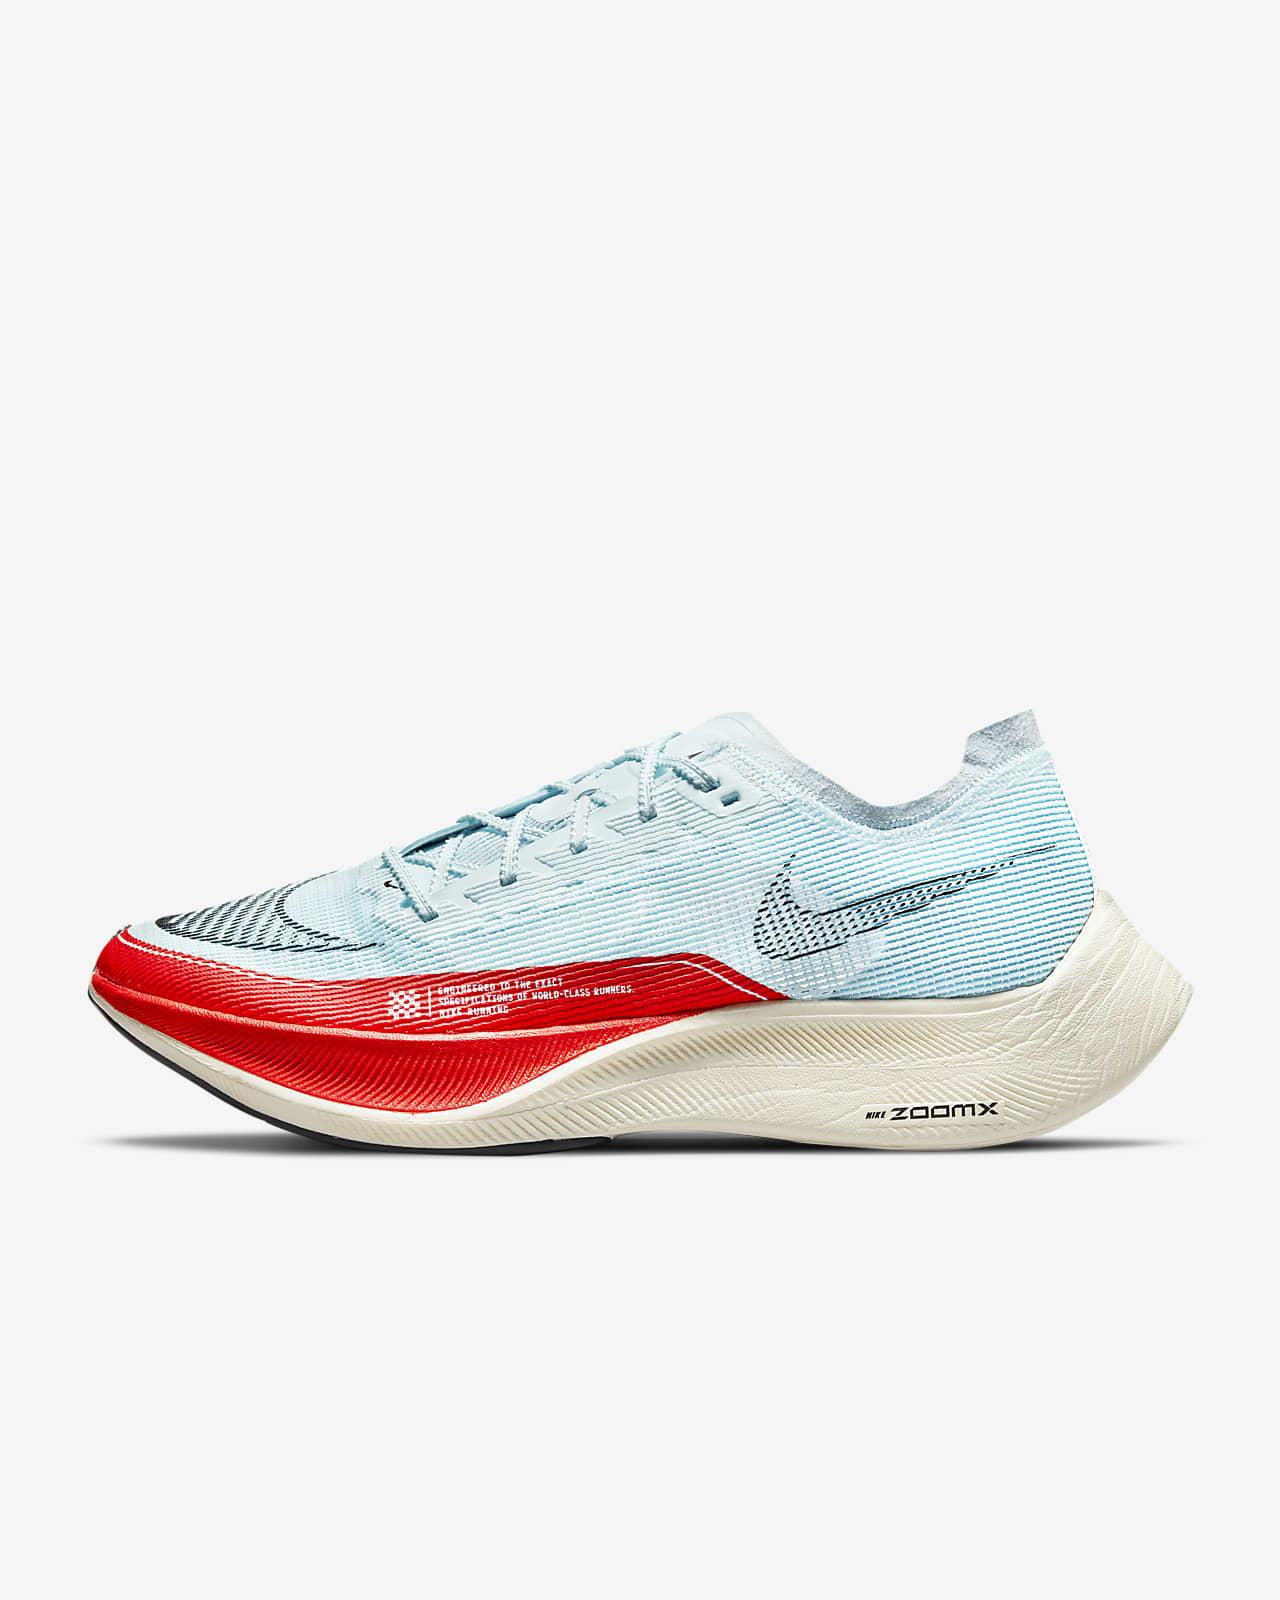 "Nike ZoomX Vaporfly Next% 2 ""OG"" Men's Racing Shoes"